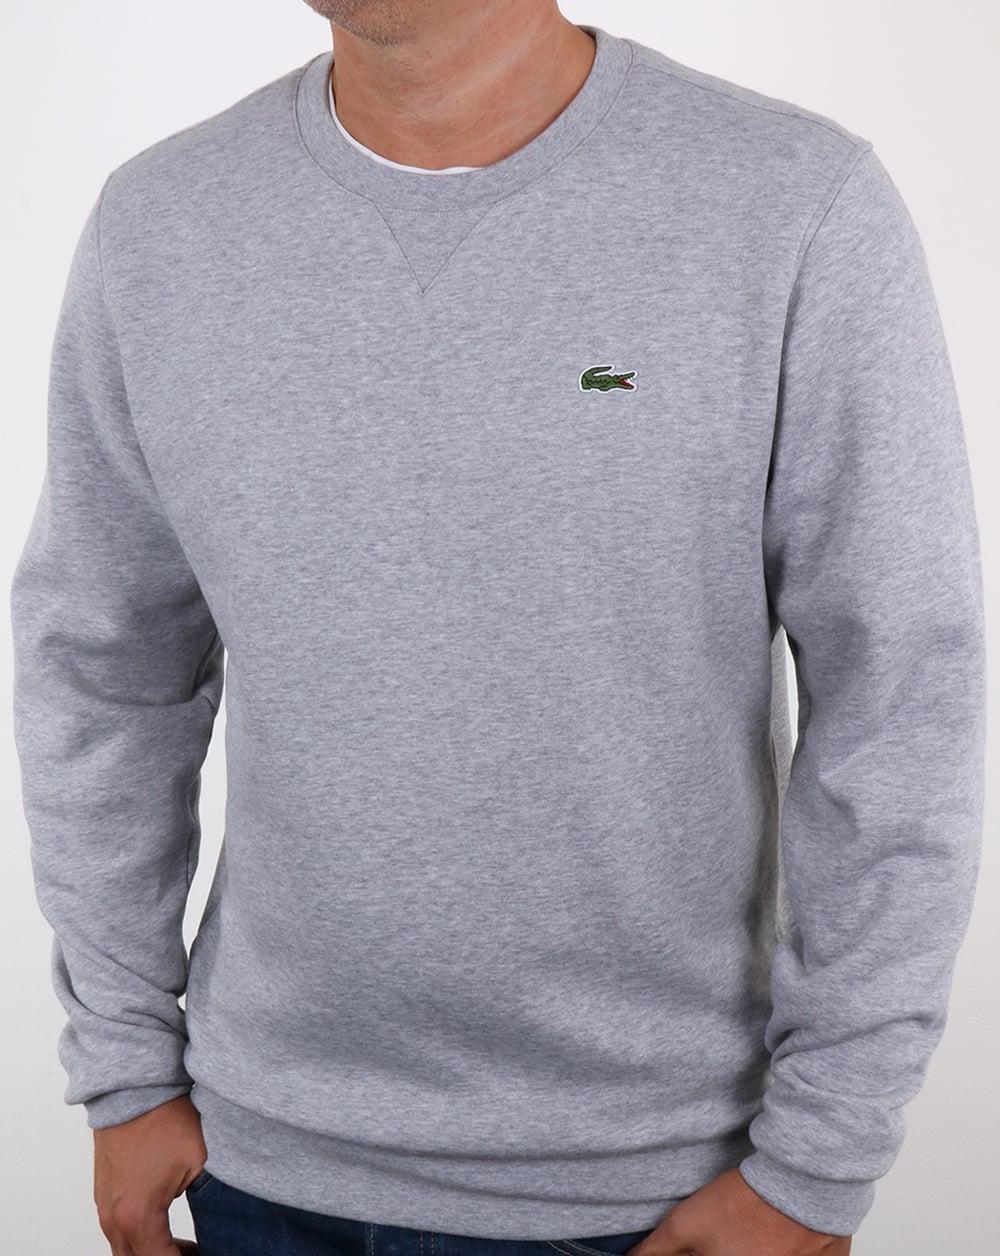 4651134f0 Lacoste Crew Neck Sweatshirt Grey Marl